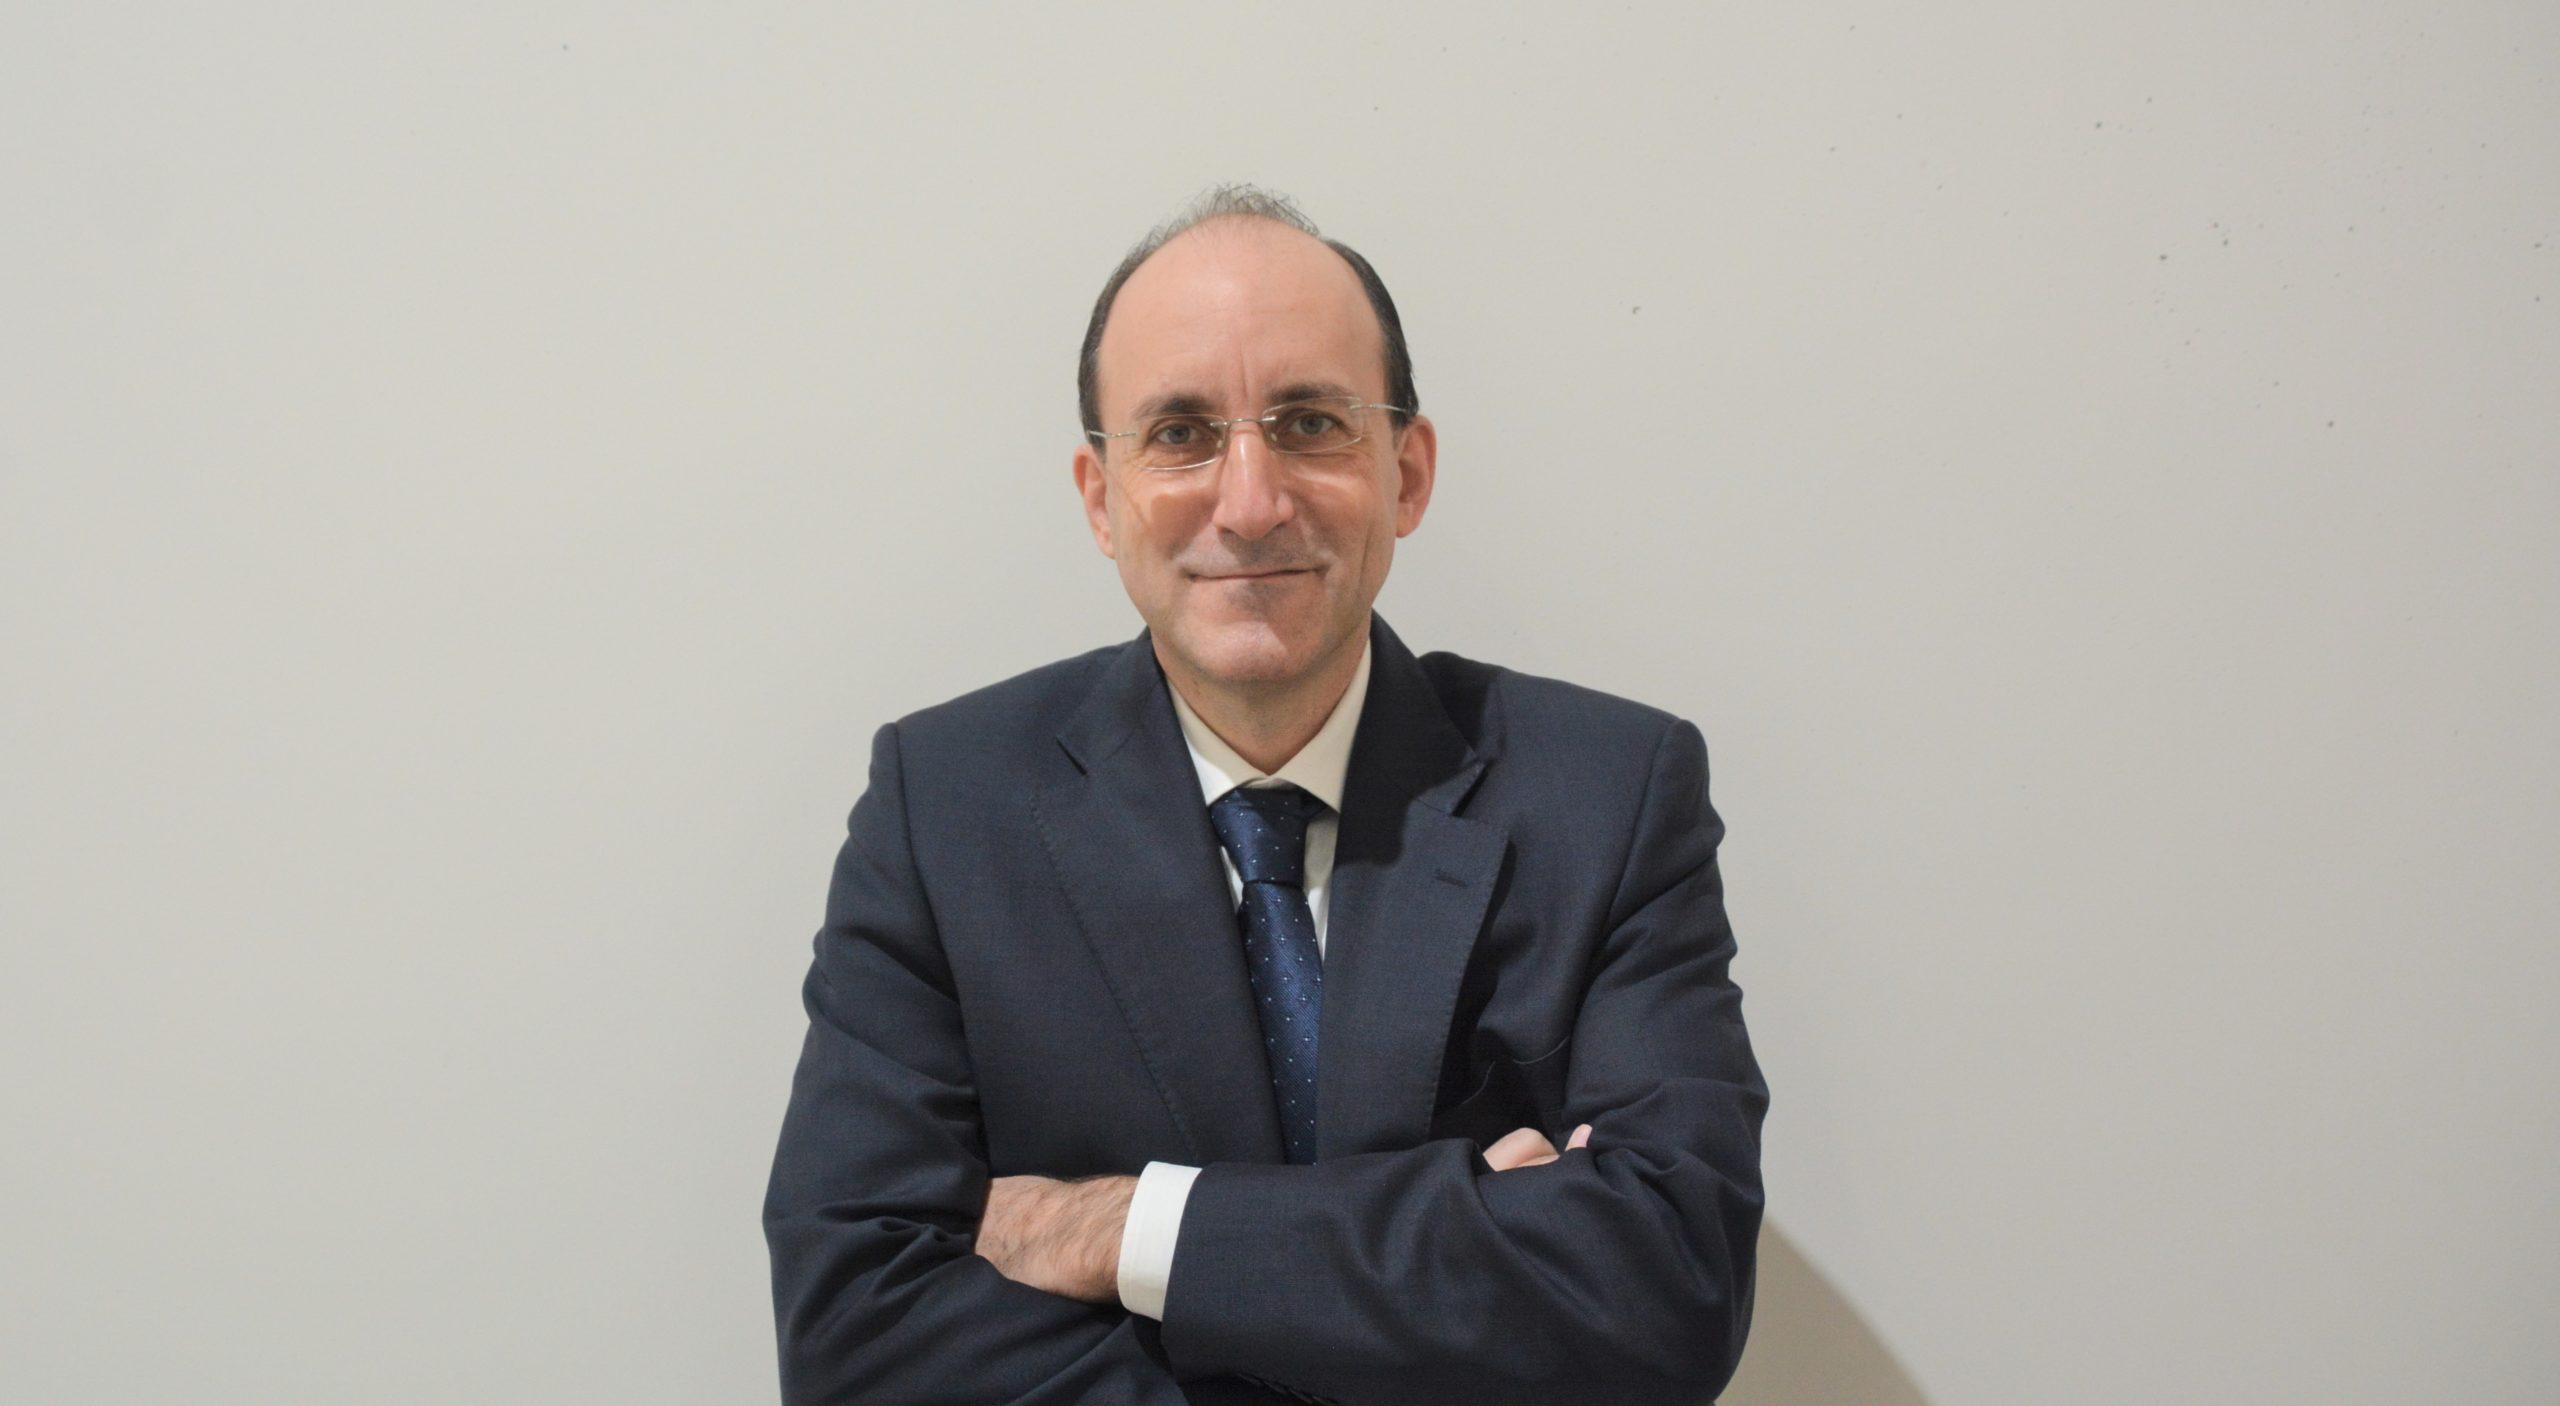 Pablo Gadea